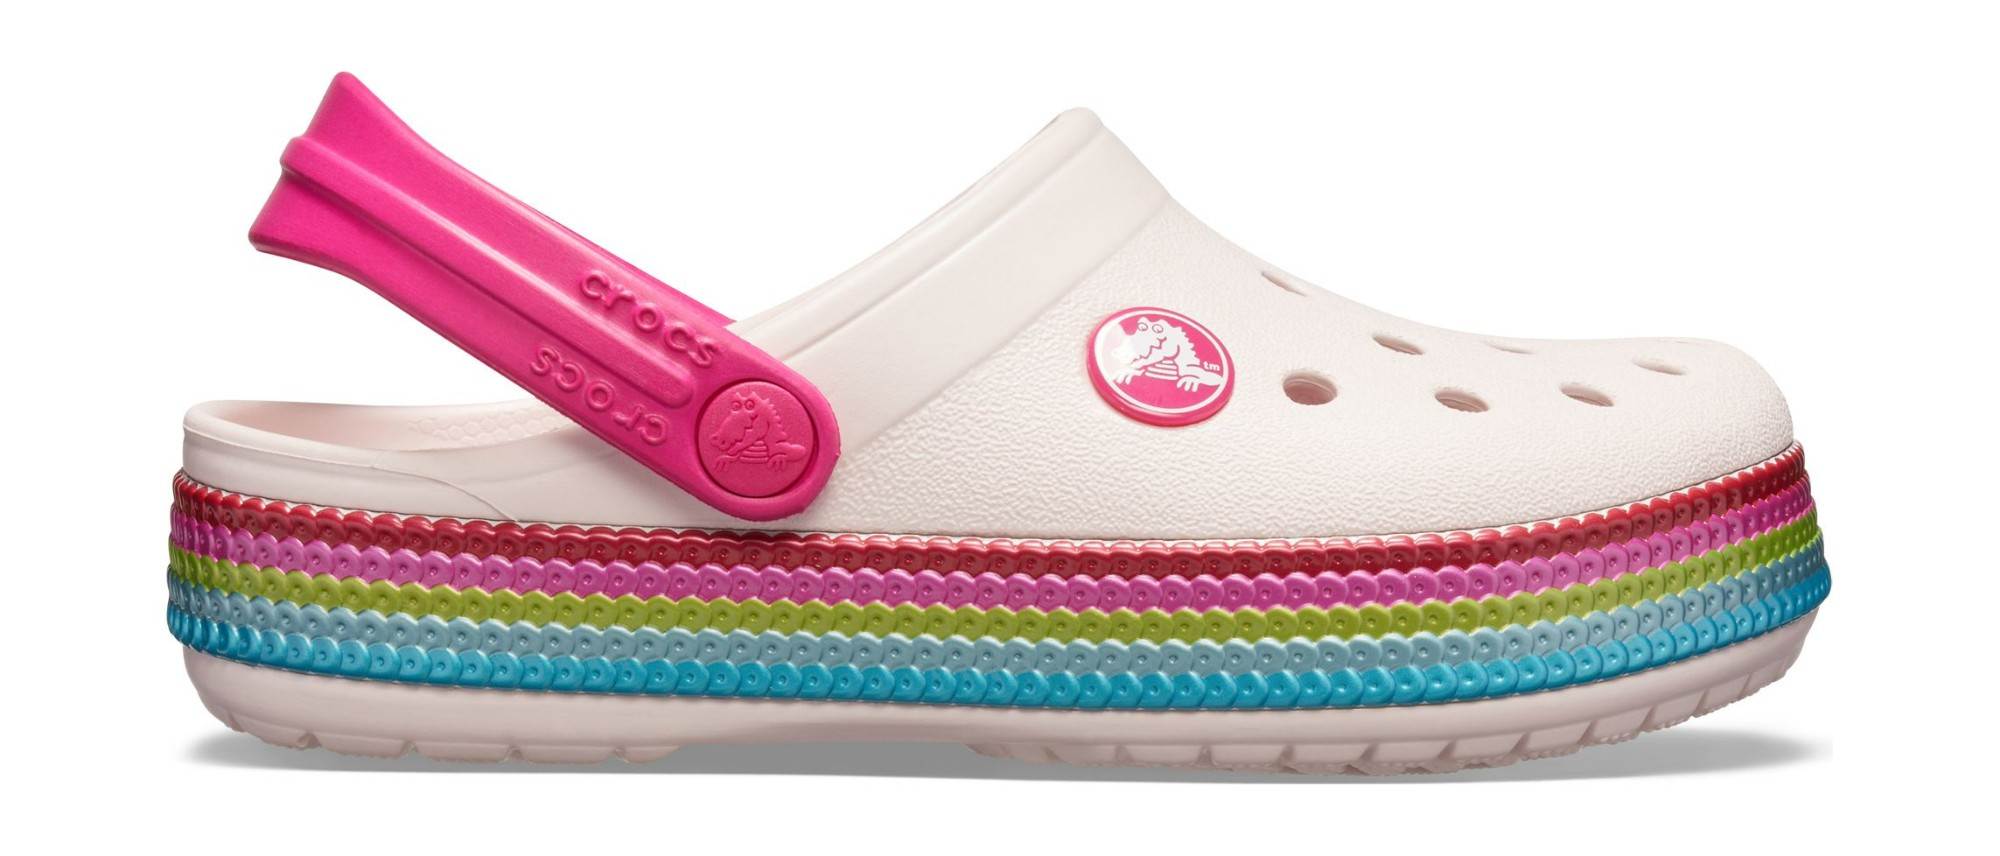 Crocs™ Crocband Sequin Band Clog Kid's Barely Pink 21